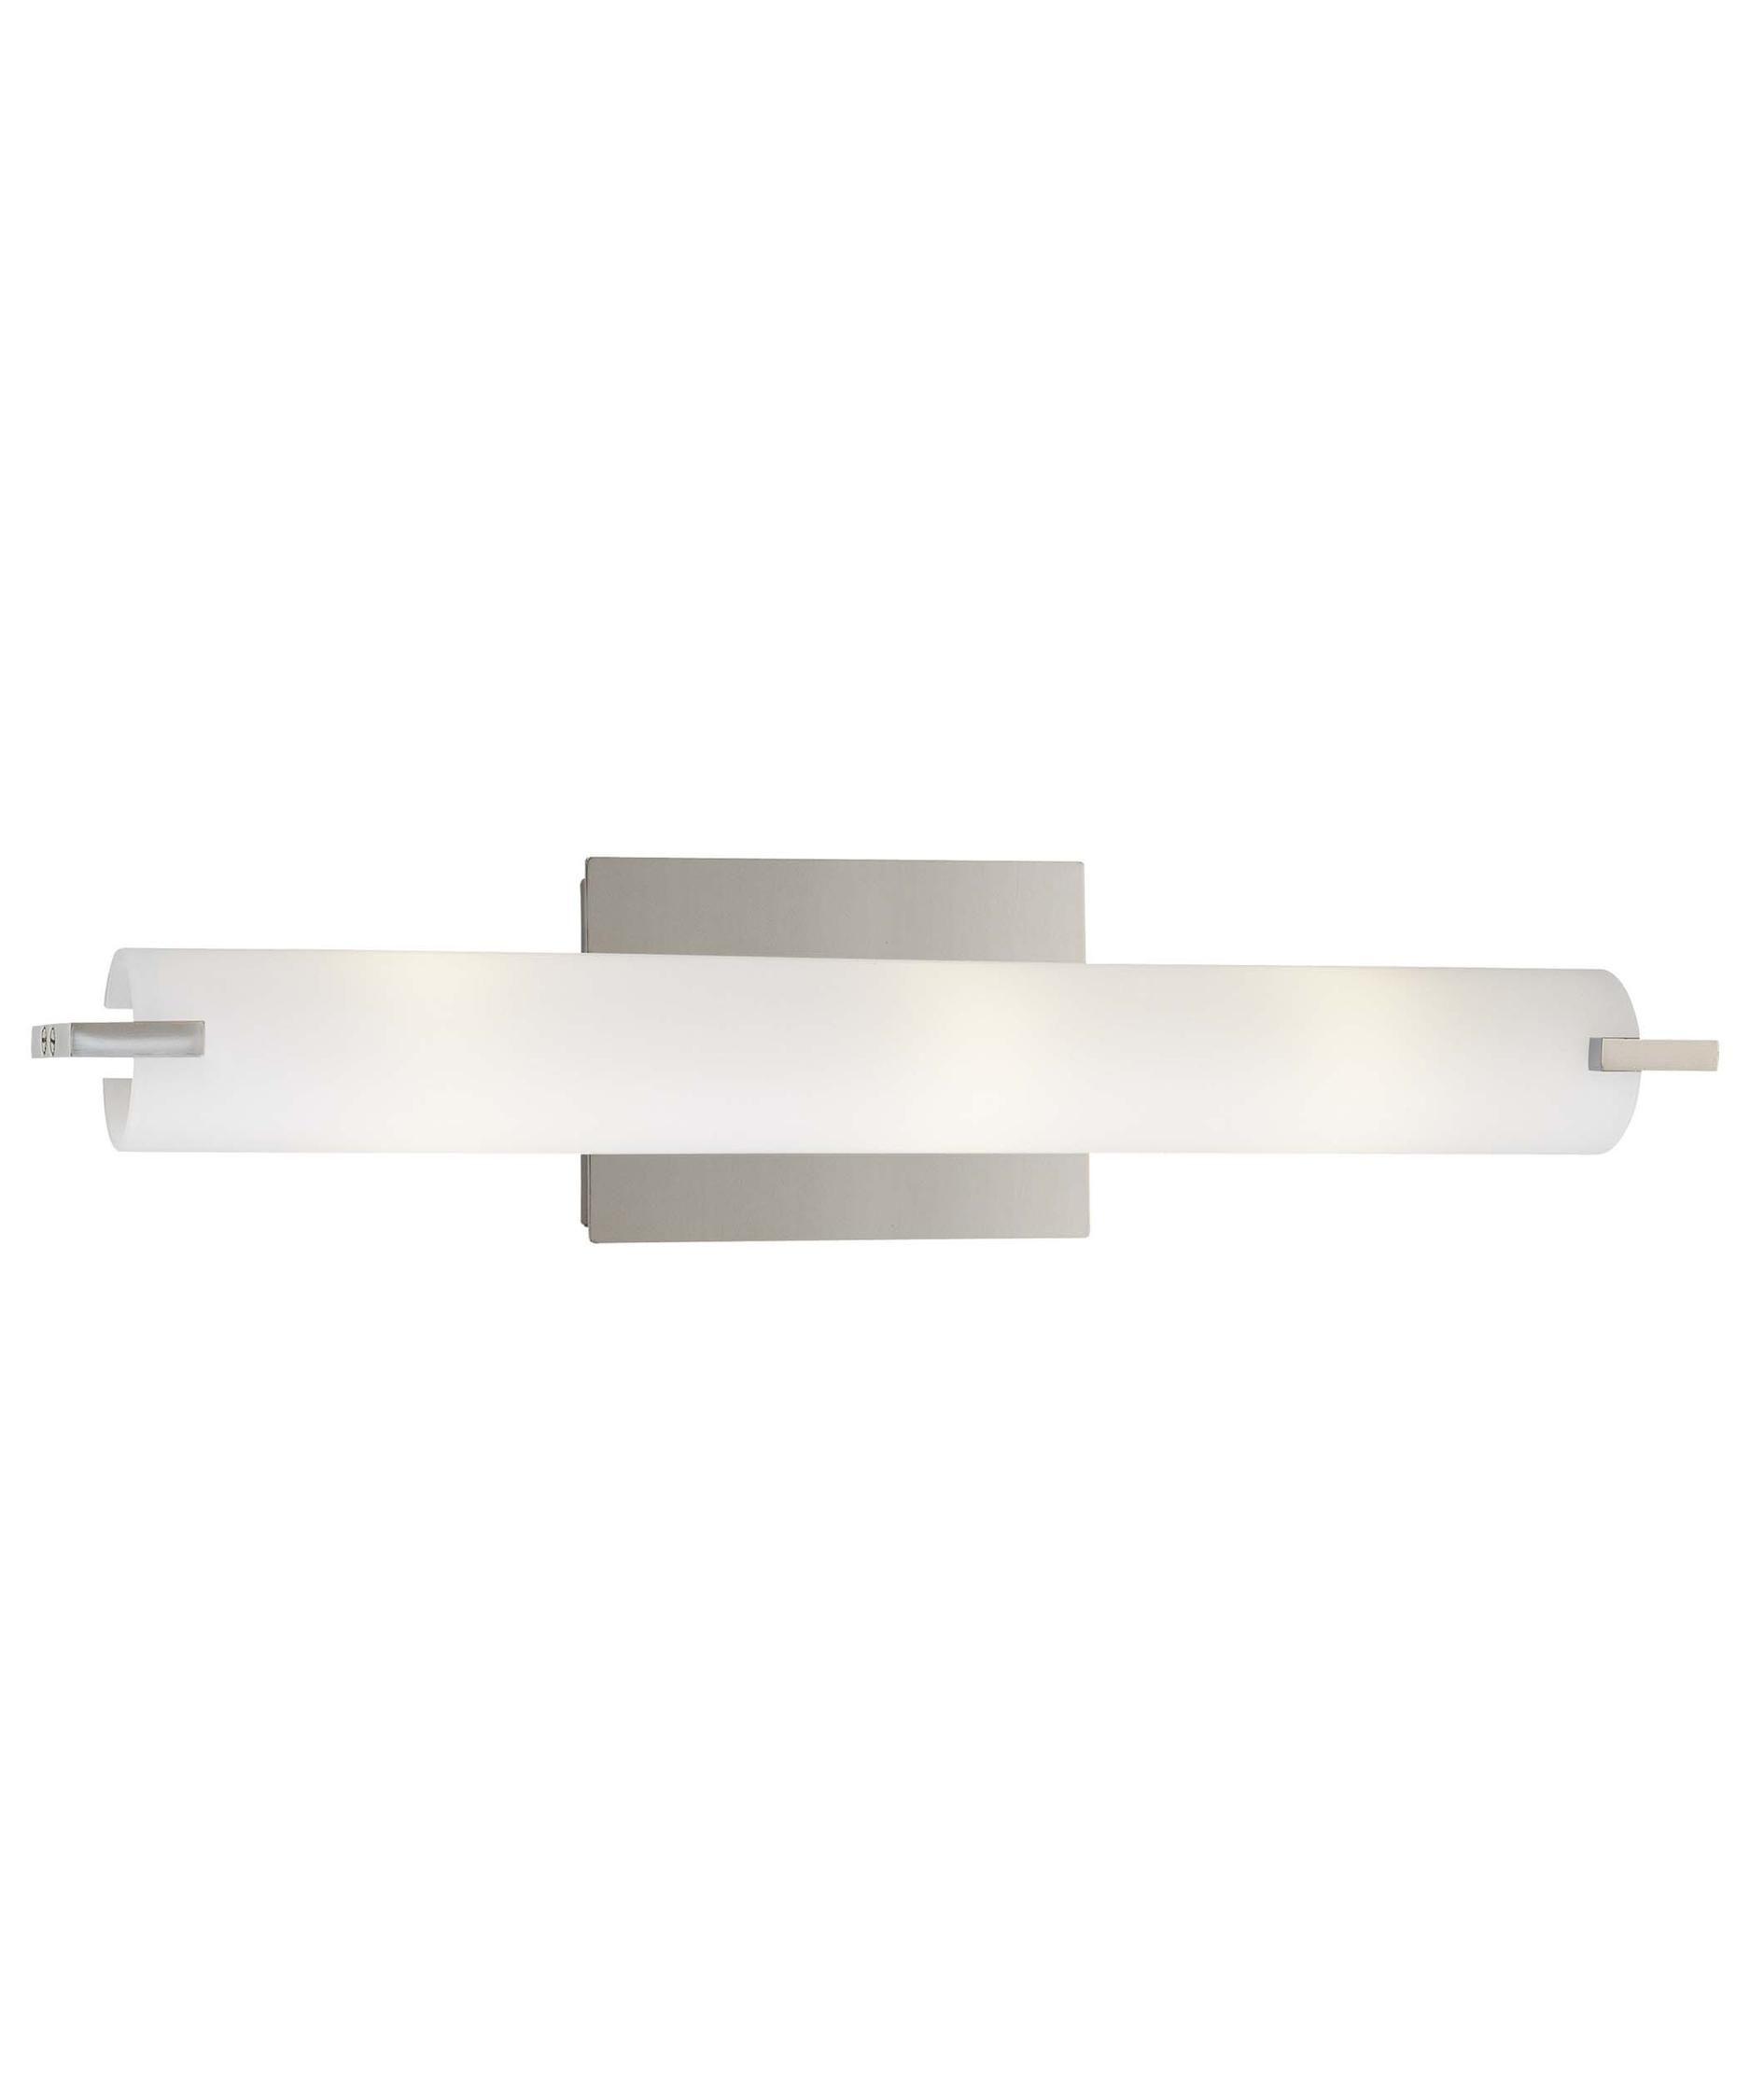 Kovacs P5044 Tubes 21 Inch Bath Vanity Light| Capitol Lighting 1 ...